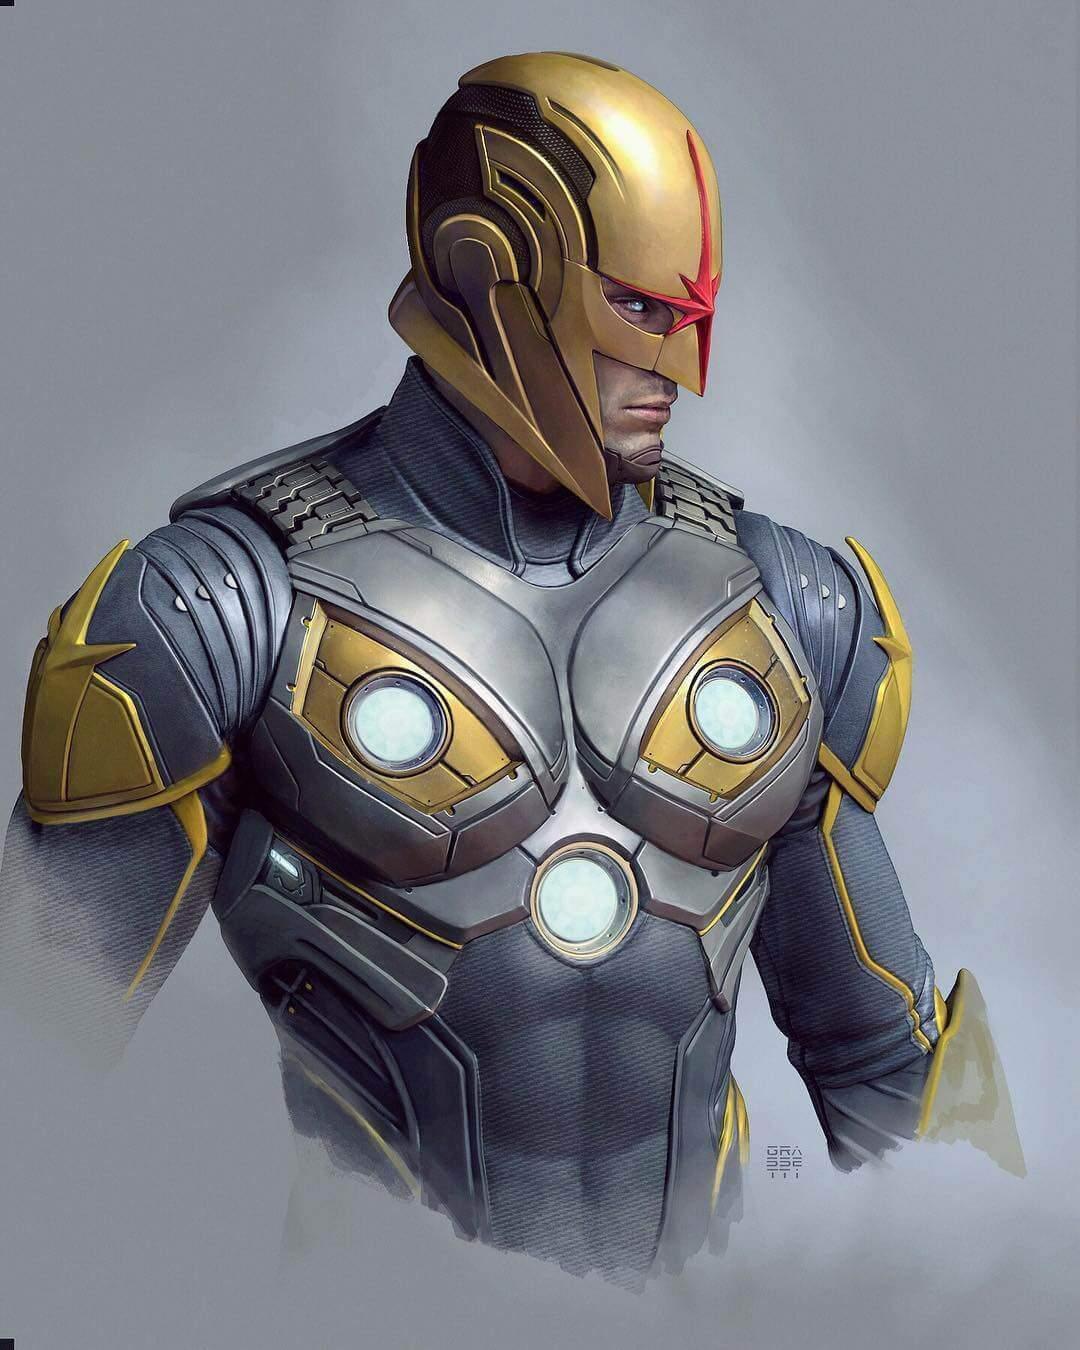 Daredevil Yellow Suit Concept Art